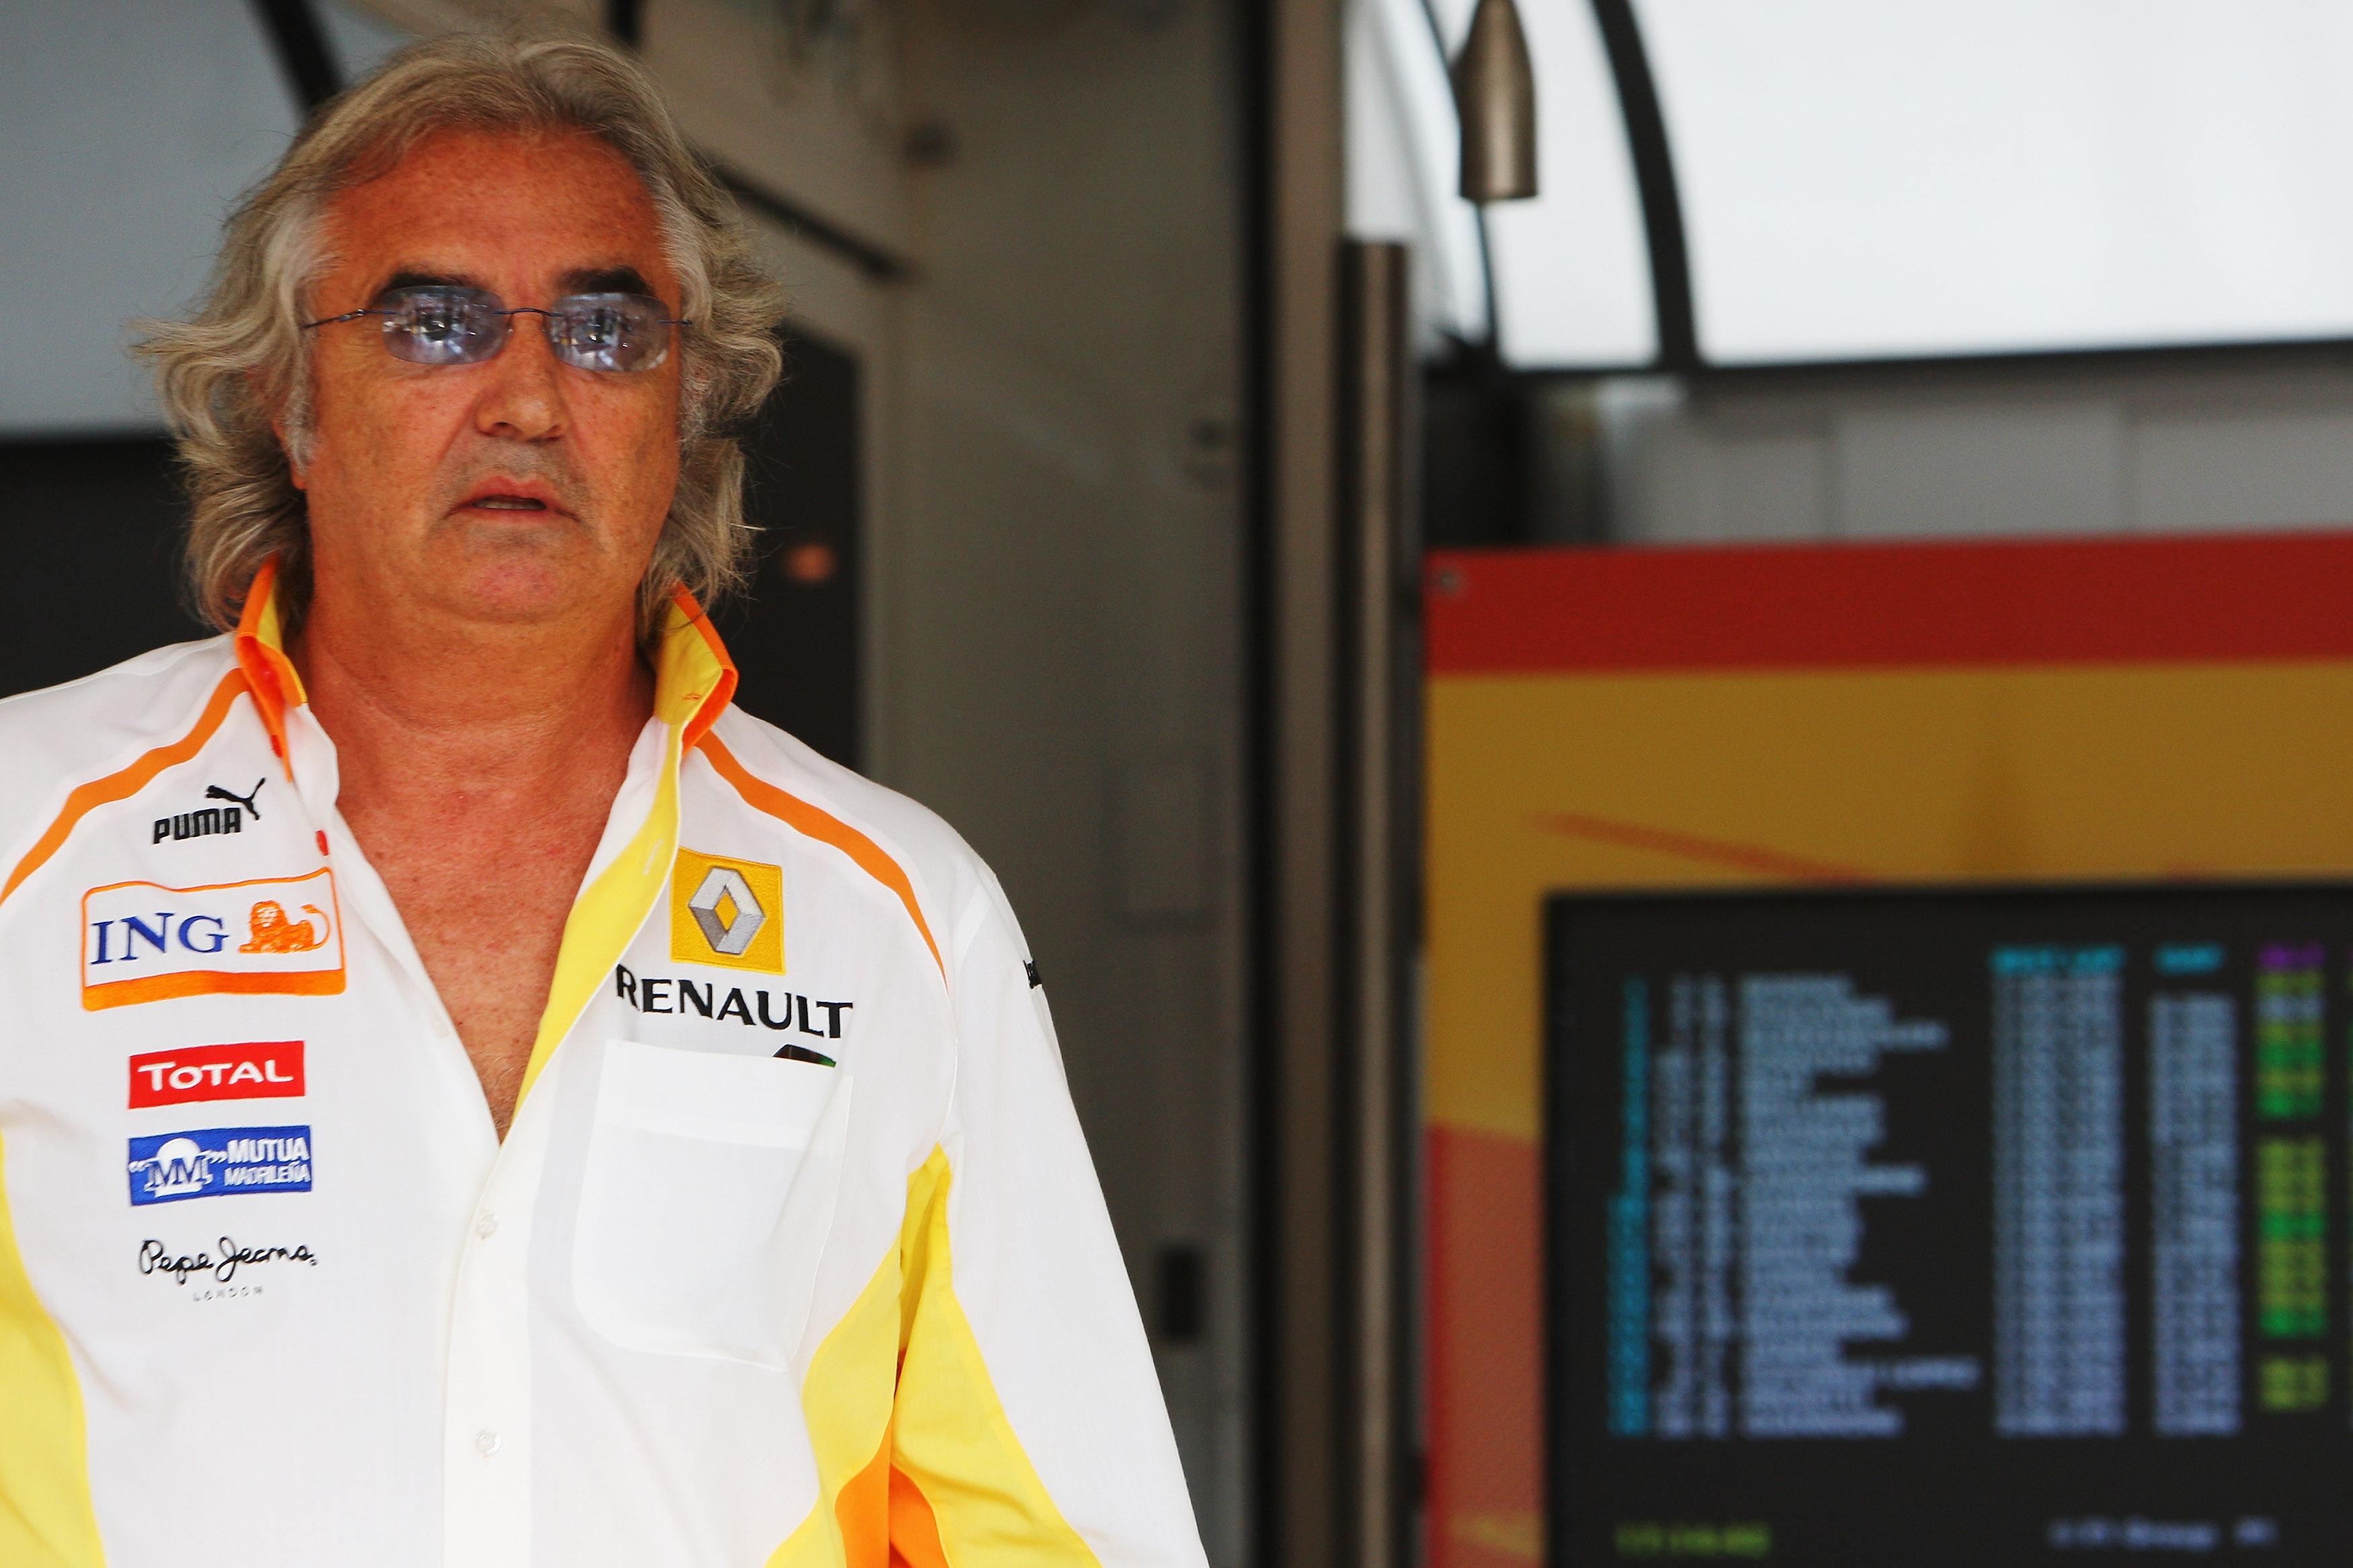 Disgraced F1 Renault boss Flavio Briatore will open his Crazy Pizza restaurant in London